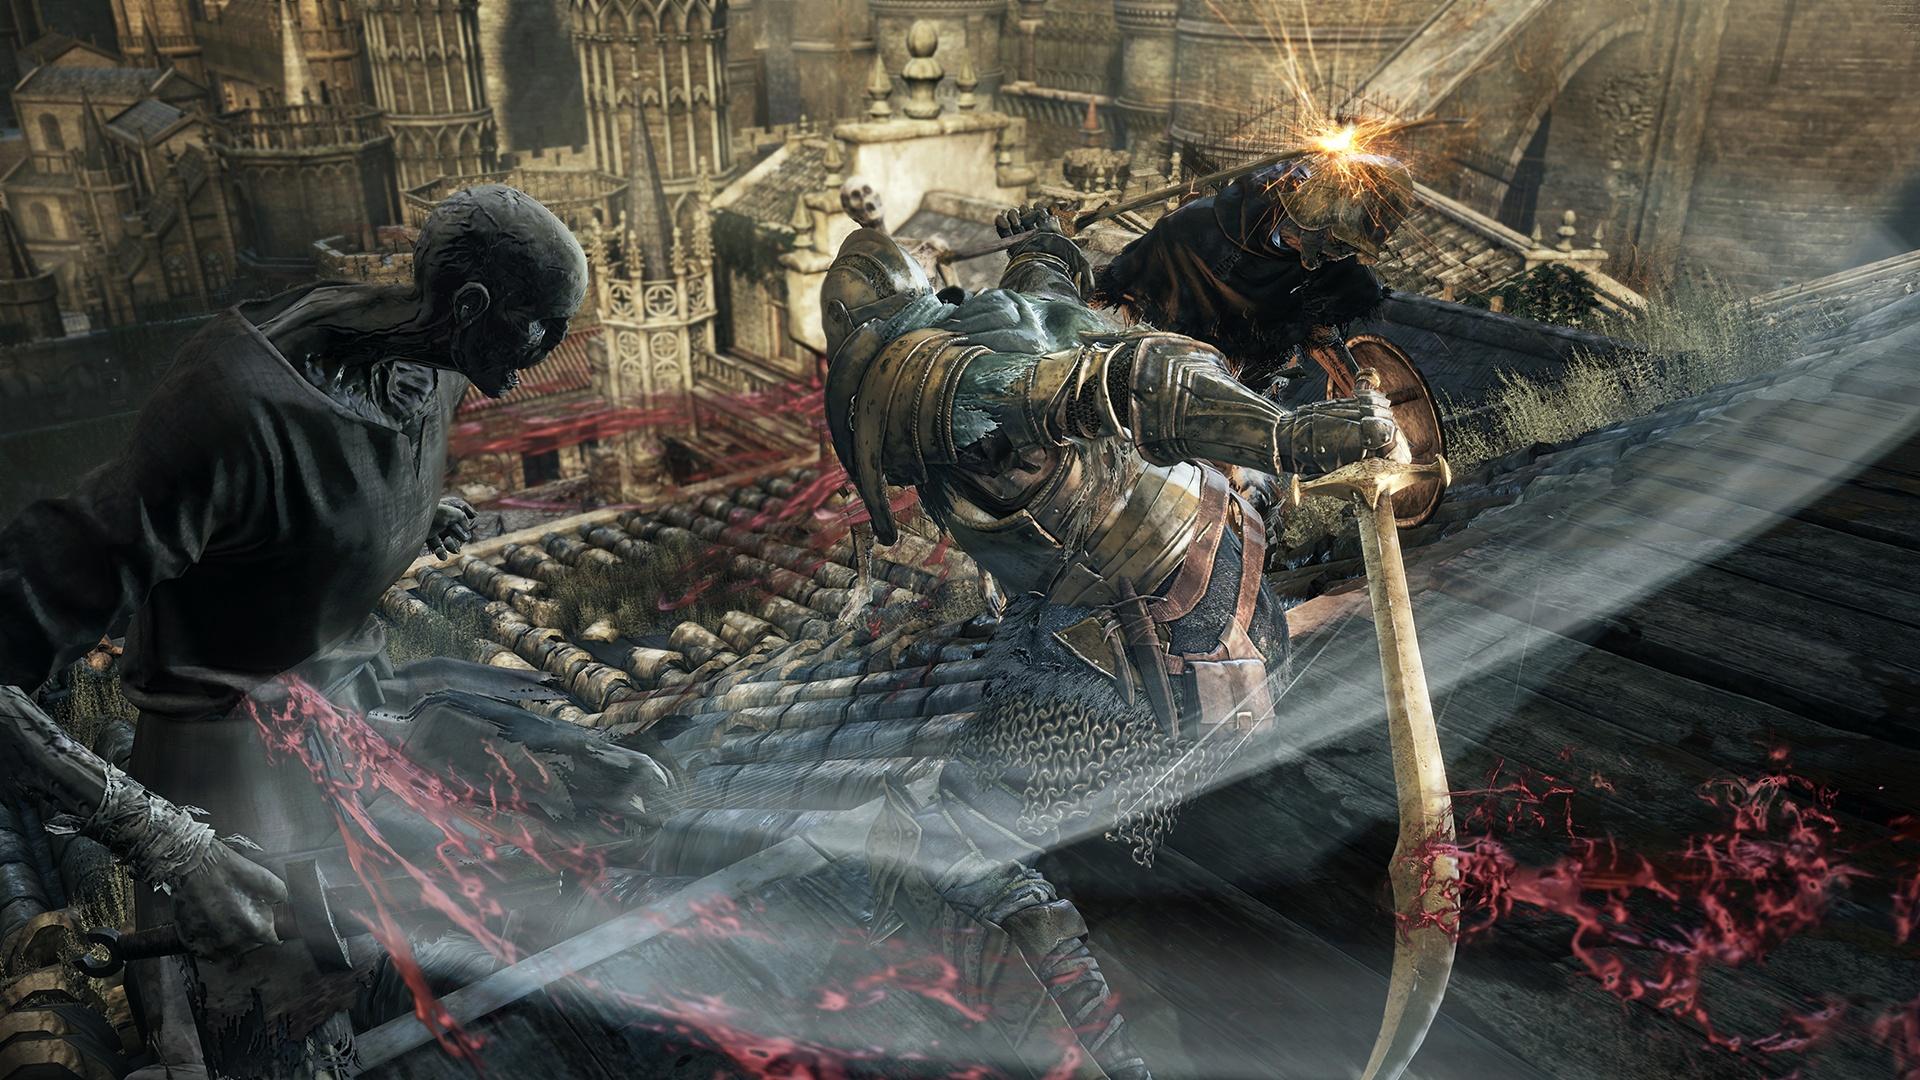 Dark Souls 3 Warrior Fighting HD Wallpaper 1920x1080